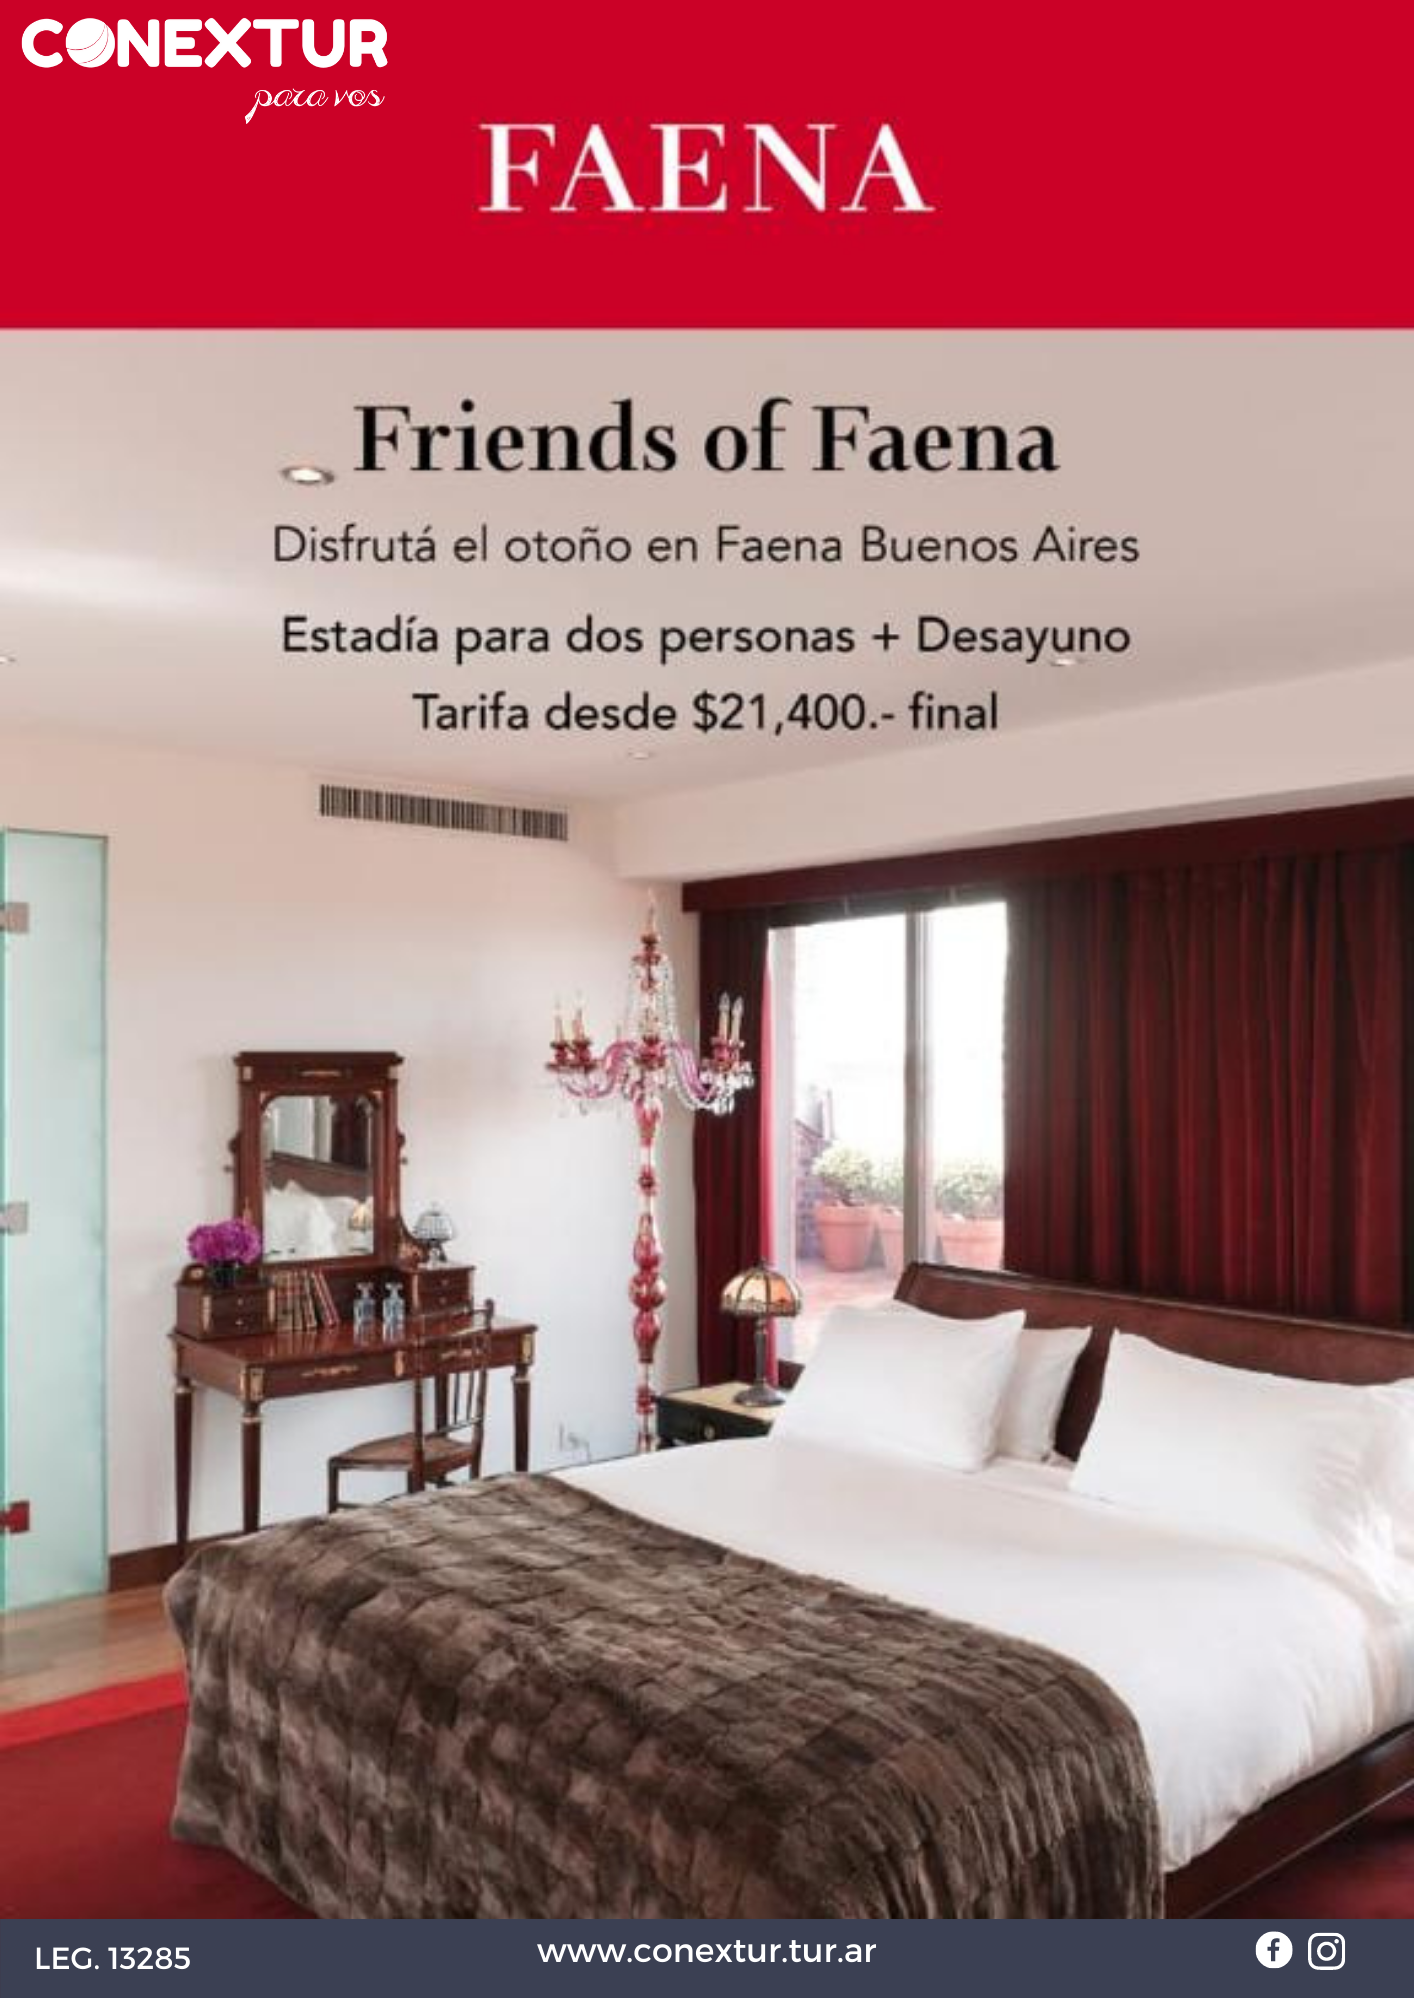 Hotel Faena - Promo Friends